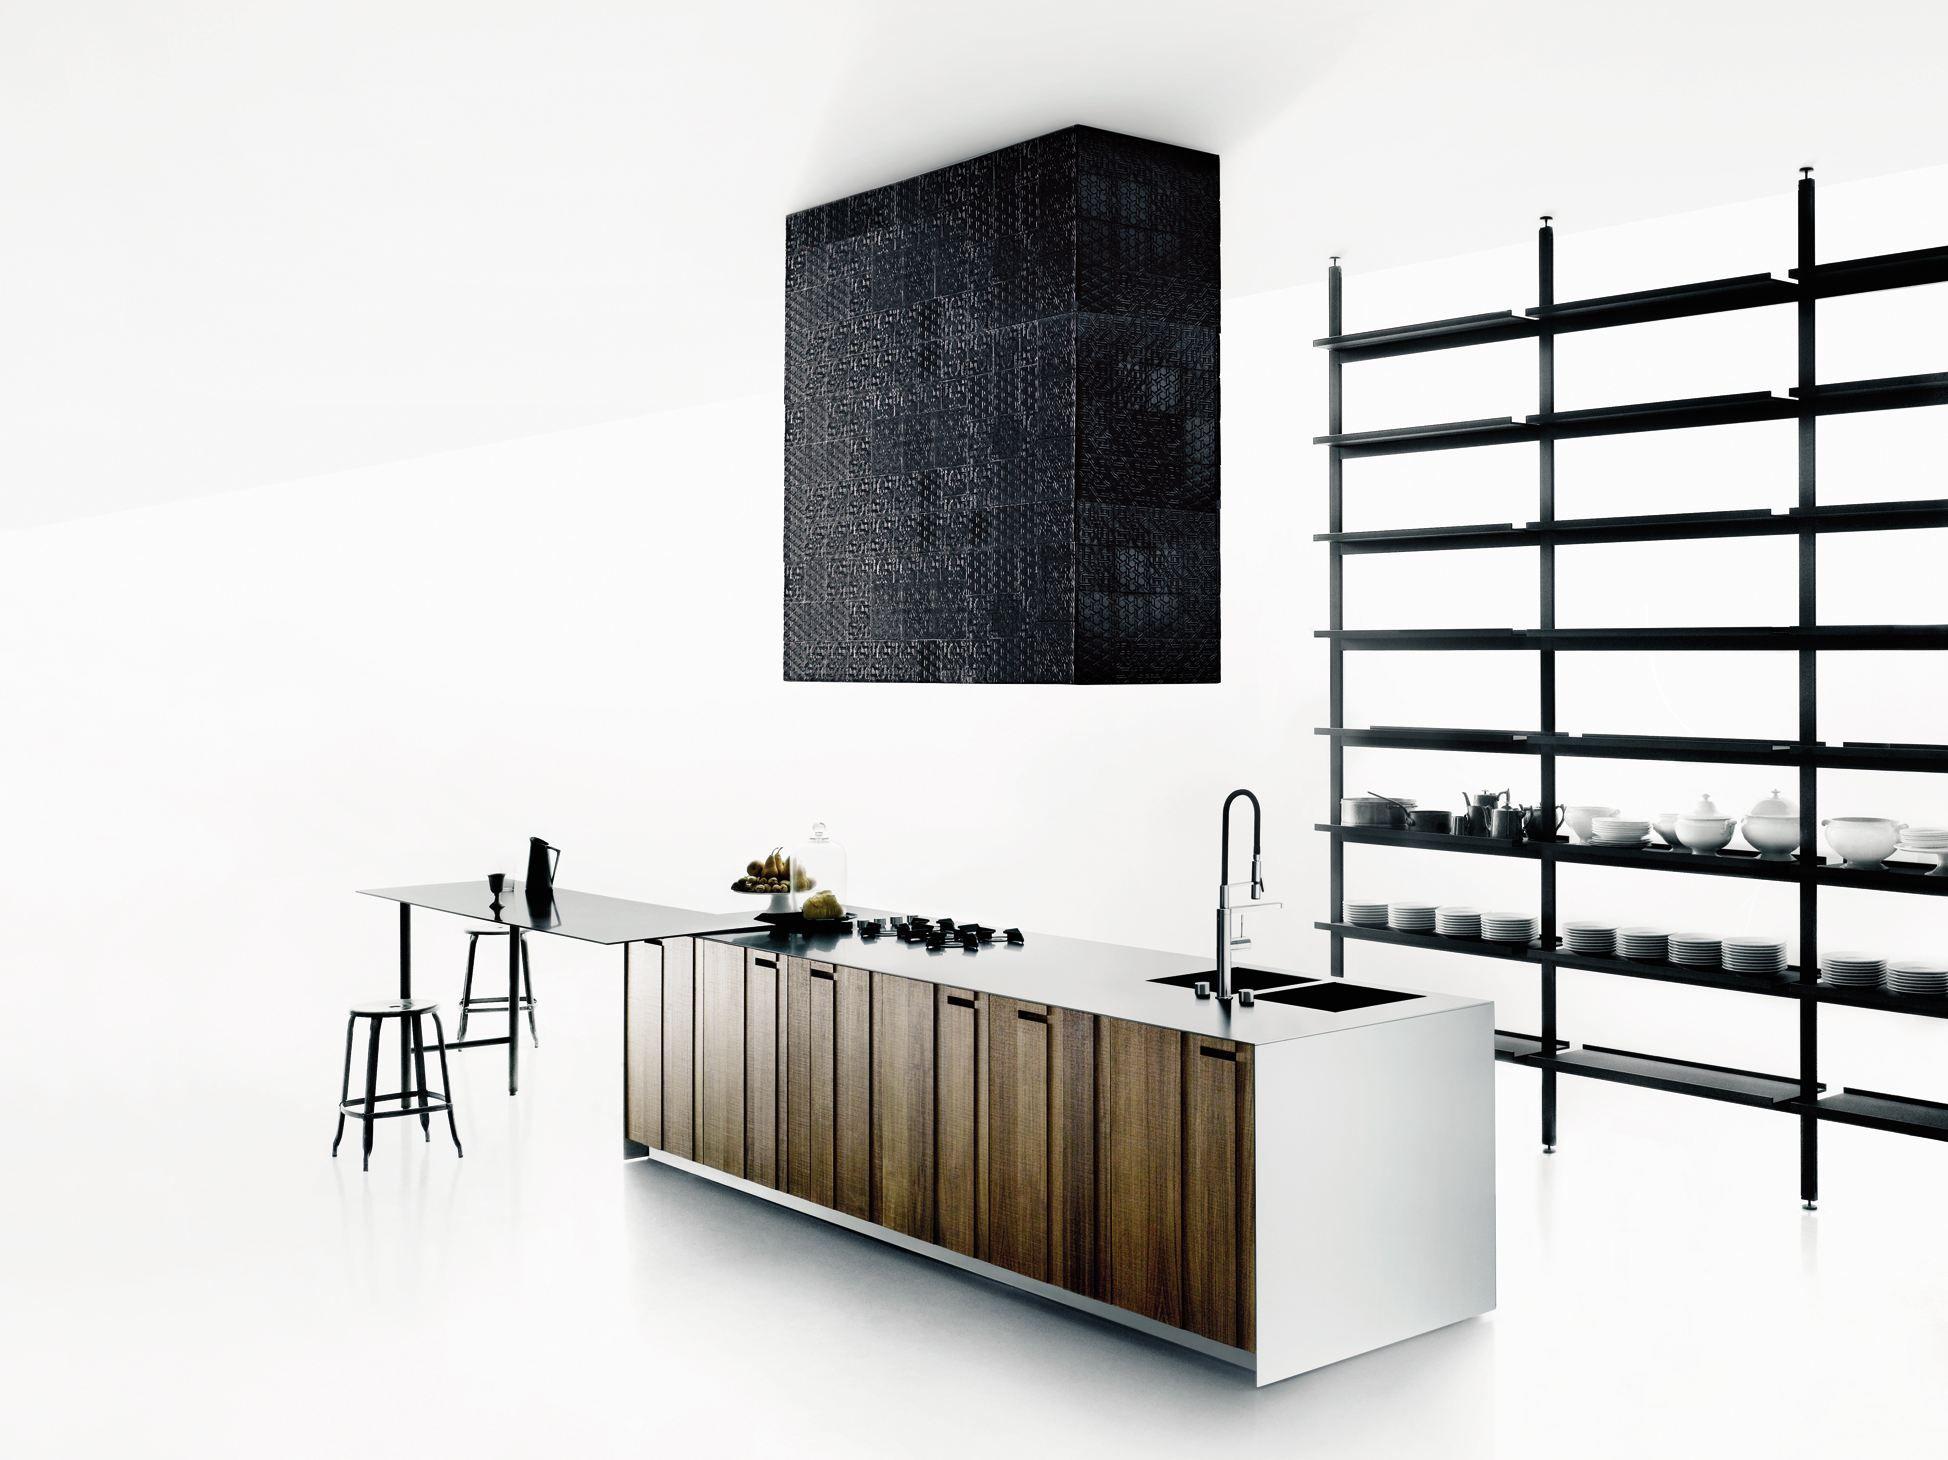 solid wood kitchen with island aprile by boffi | design piero, Innenarchitektur ideen